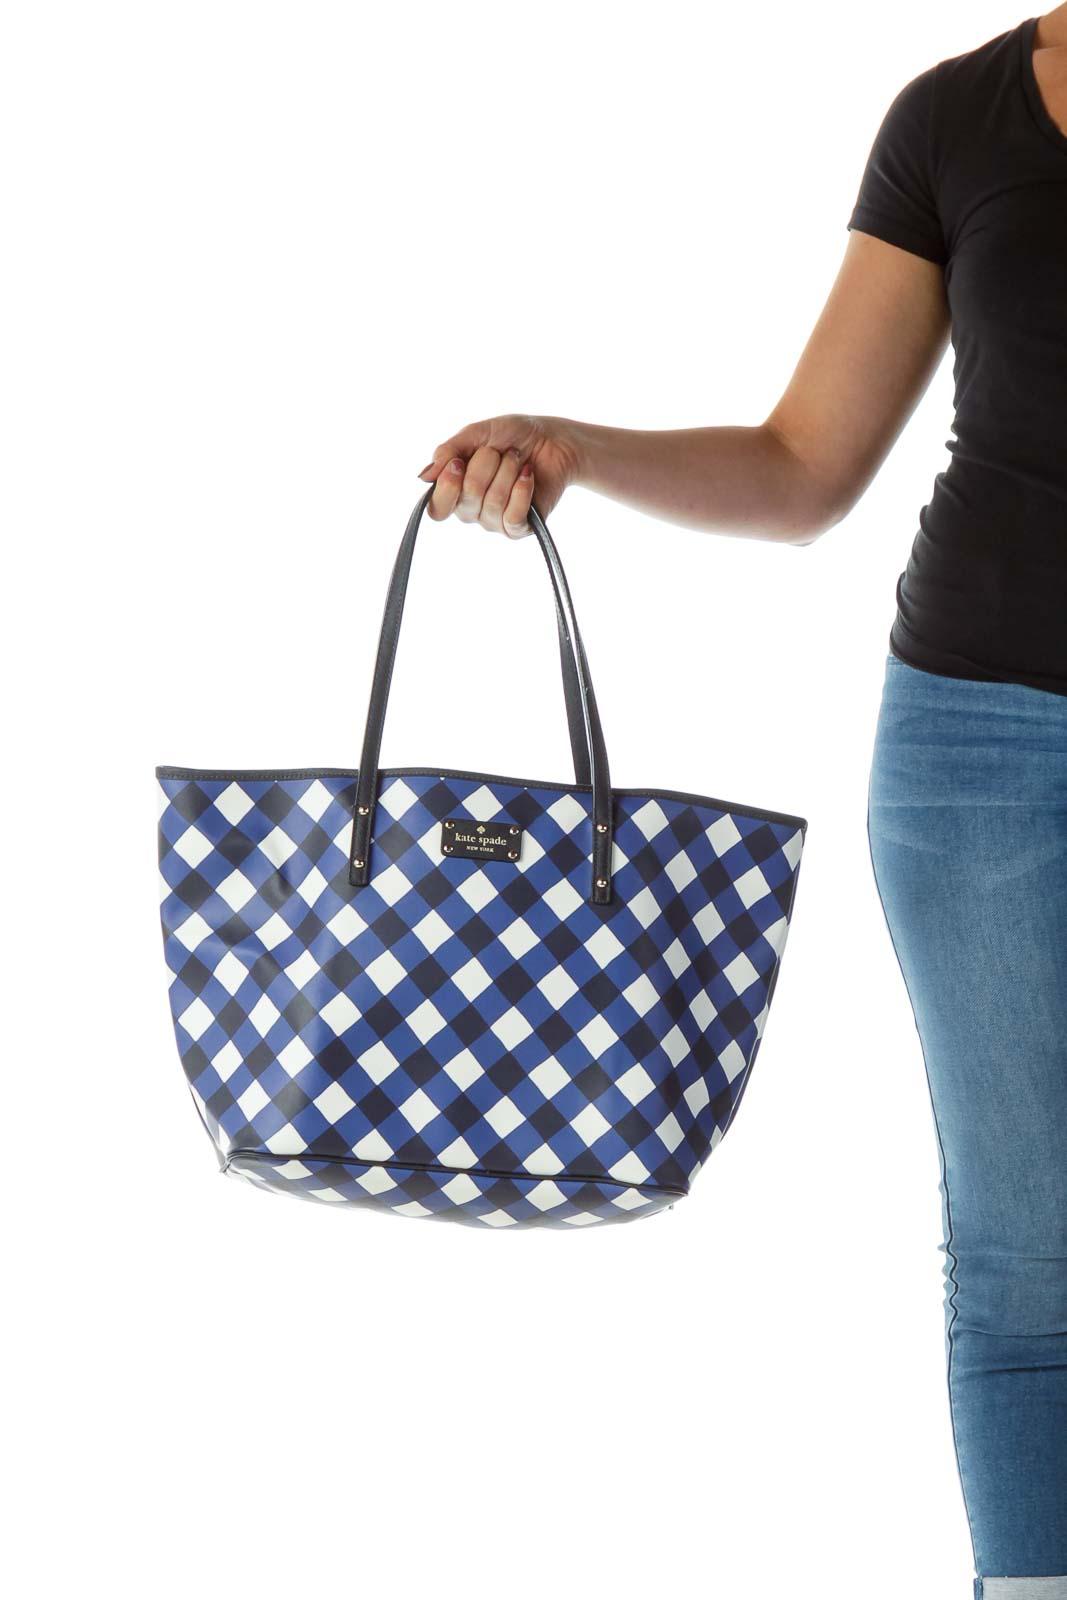 Blue White Checkered Tote Bag